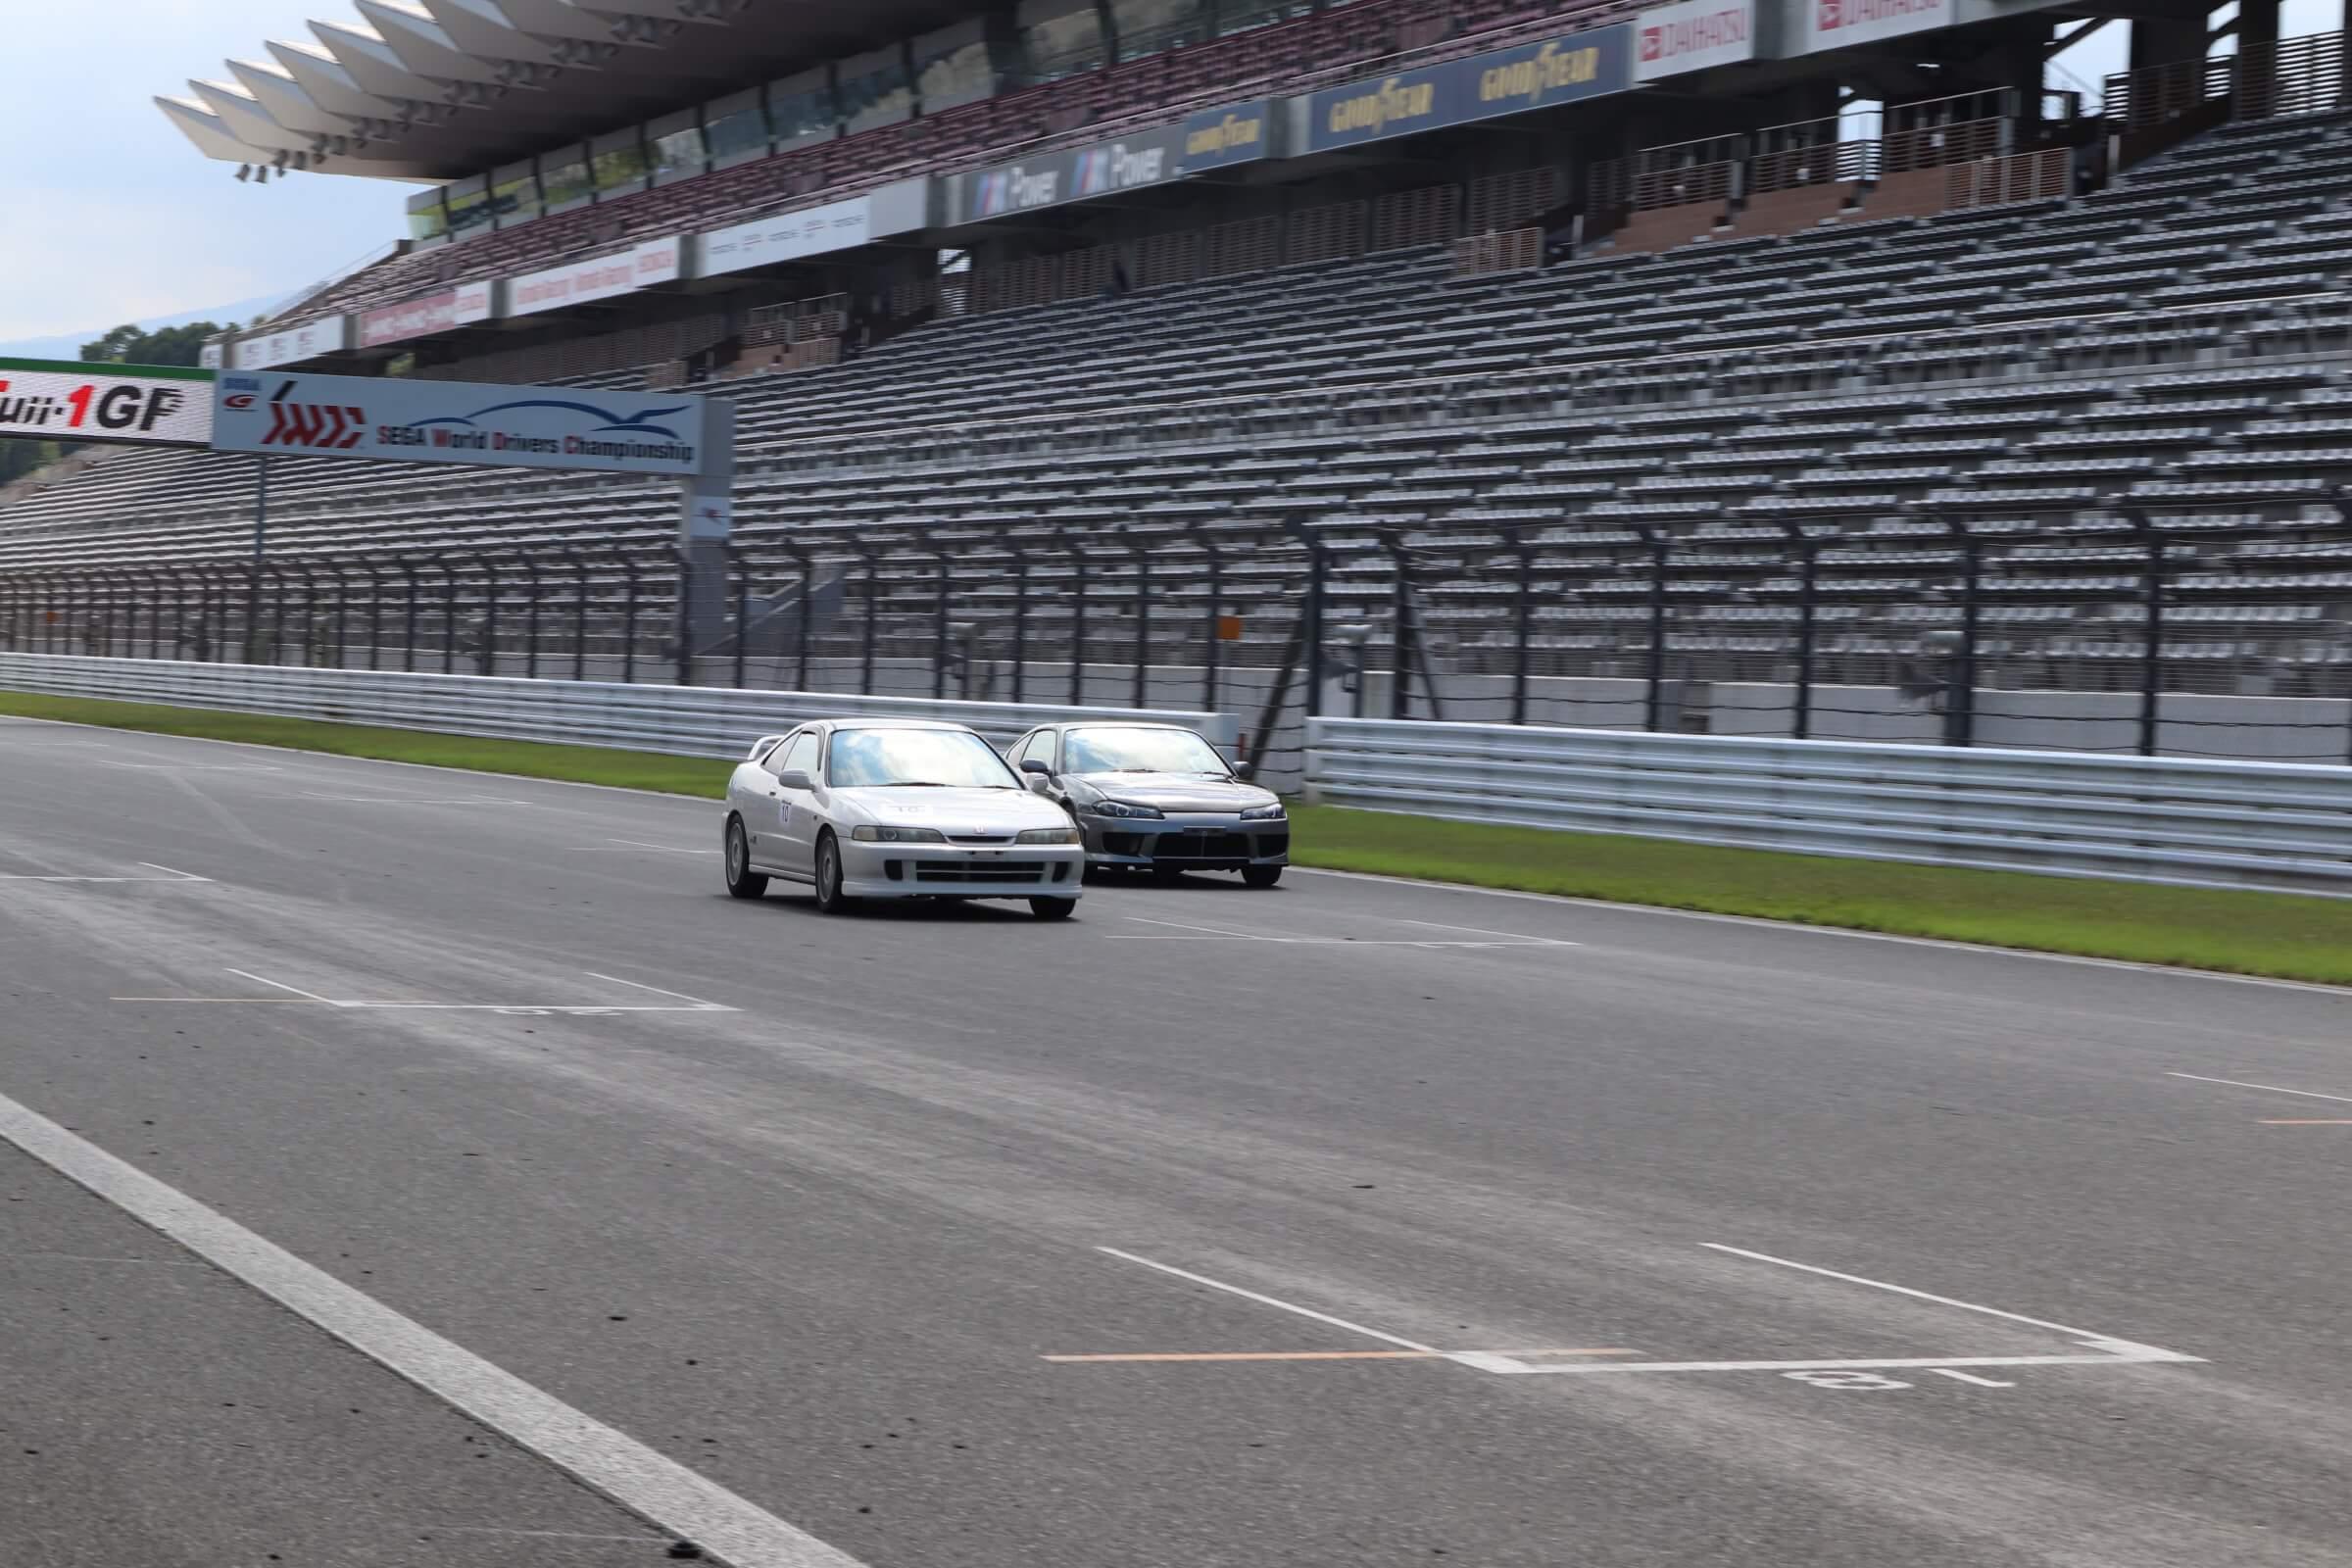 Fuji1-GP DC2レース